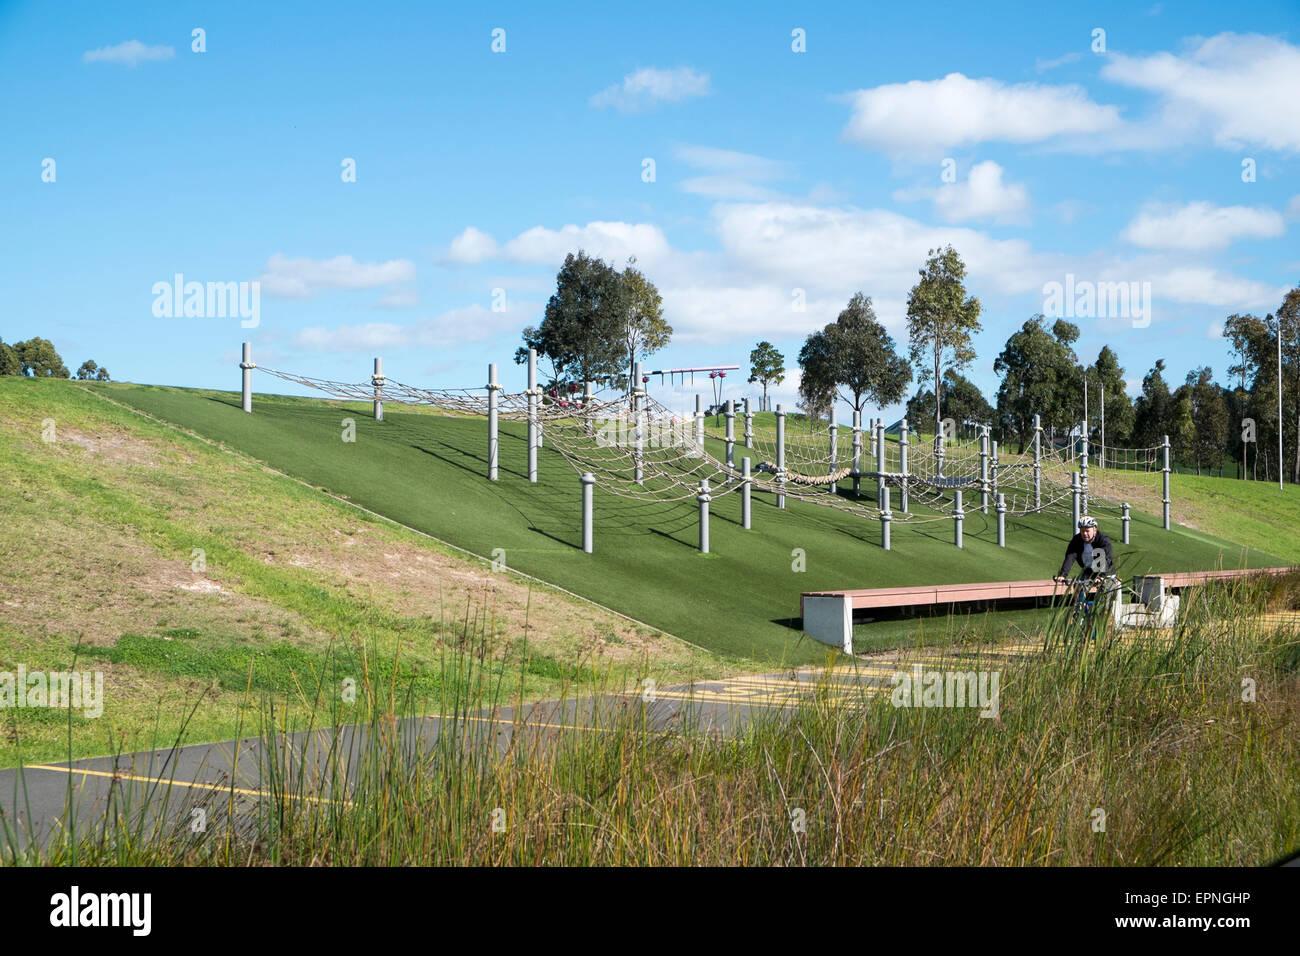 Blaxland Riverside Park In Sydney Olympic Parkwestern Sydneynew South Walesaustralia